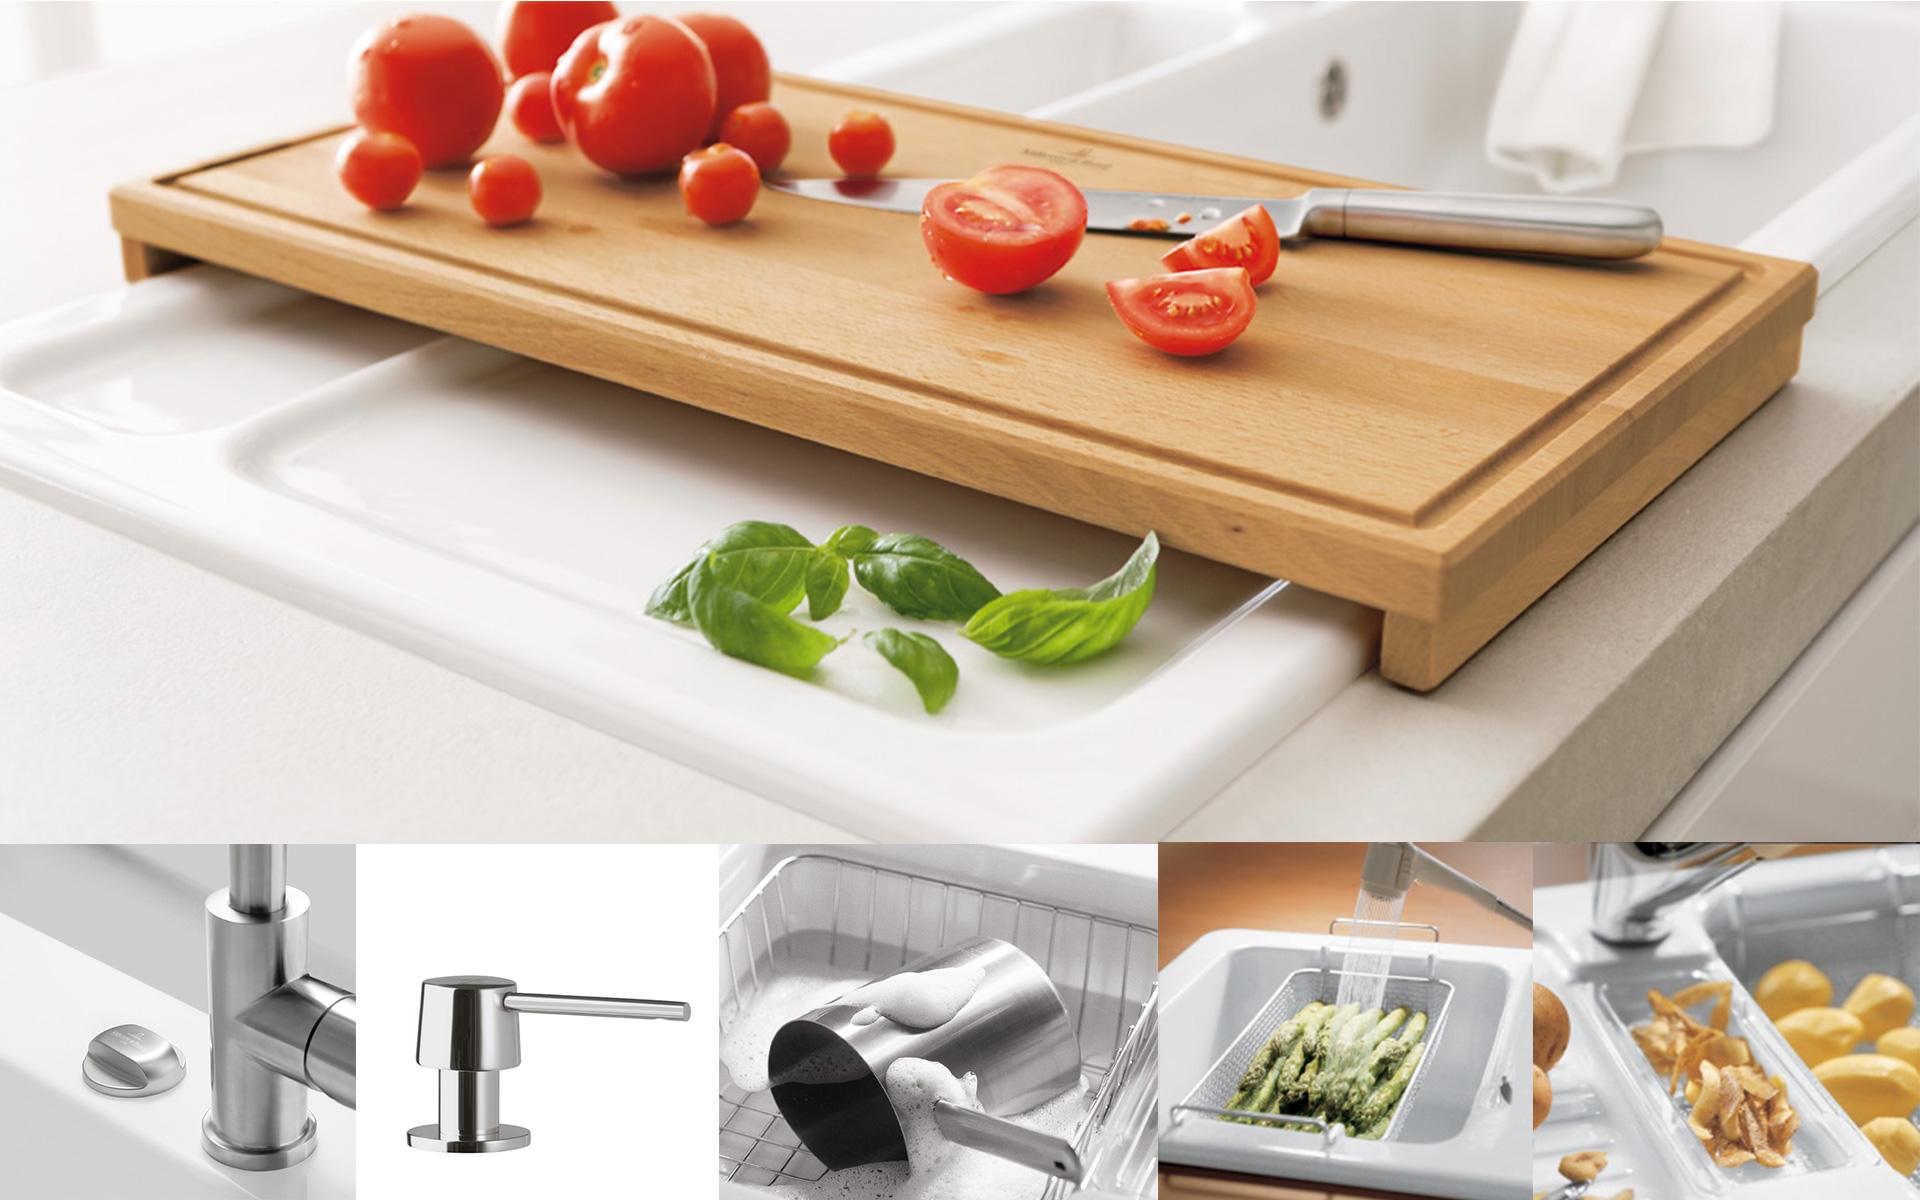 Design Keukenaccessoires : Accessori per la cucina Villeroy & Boch ? Divertirsi in cucina